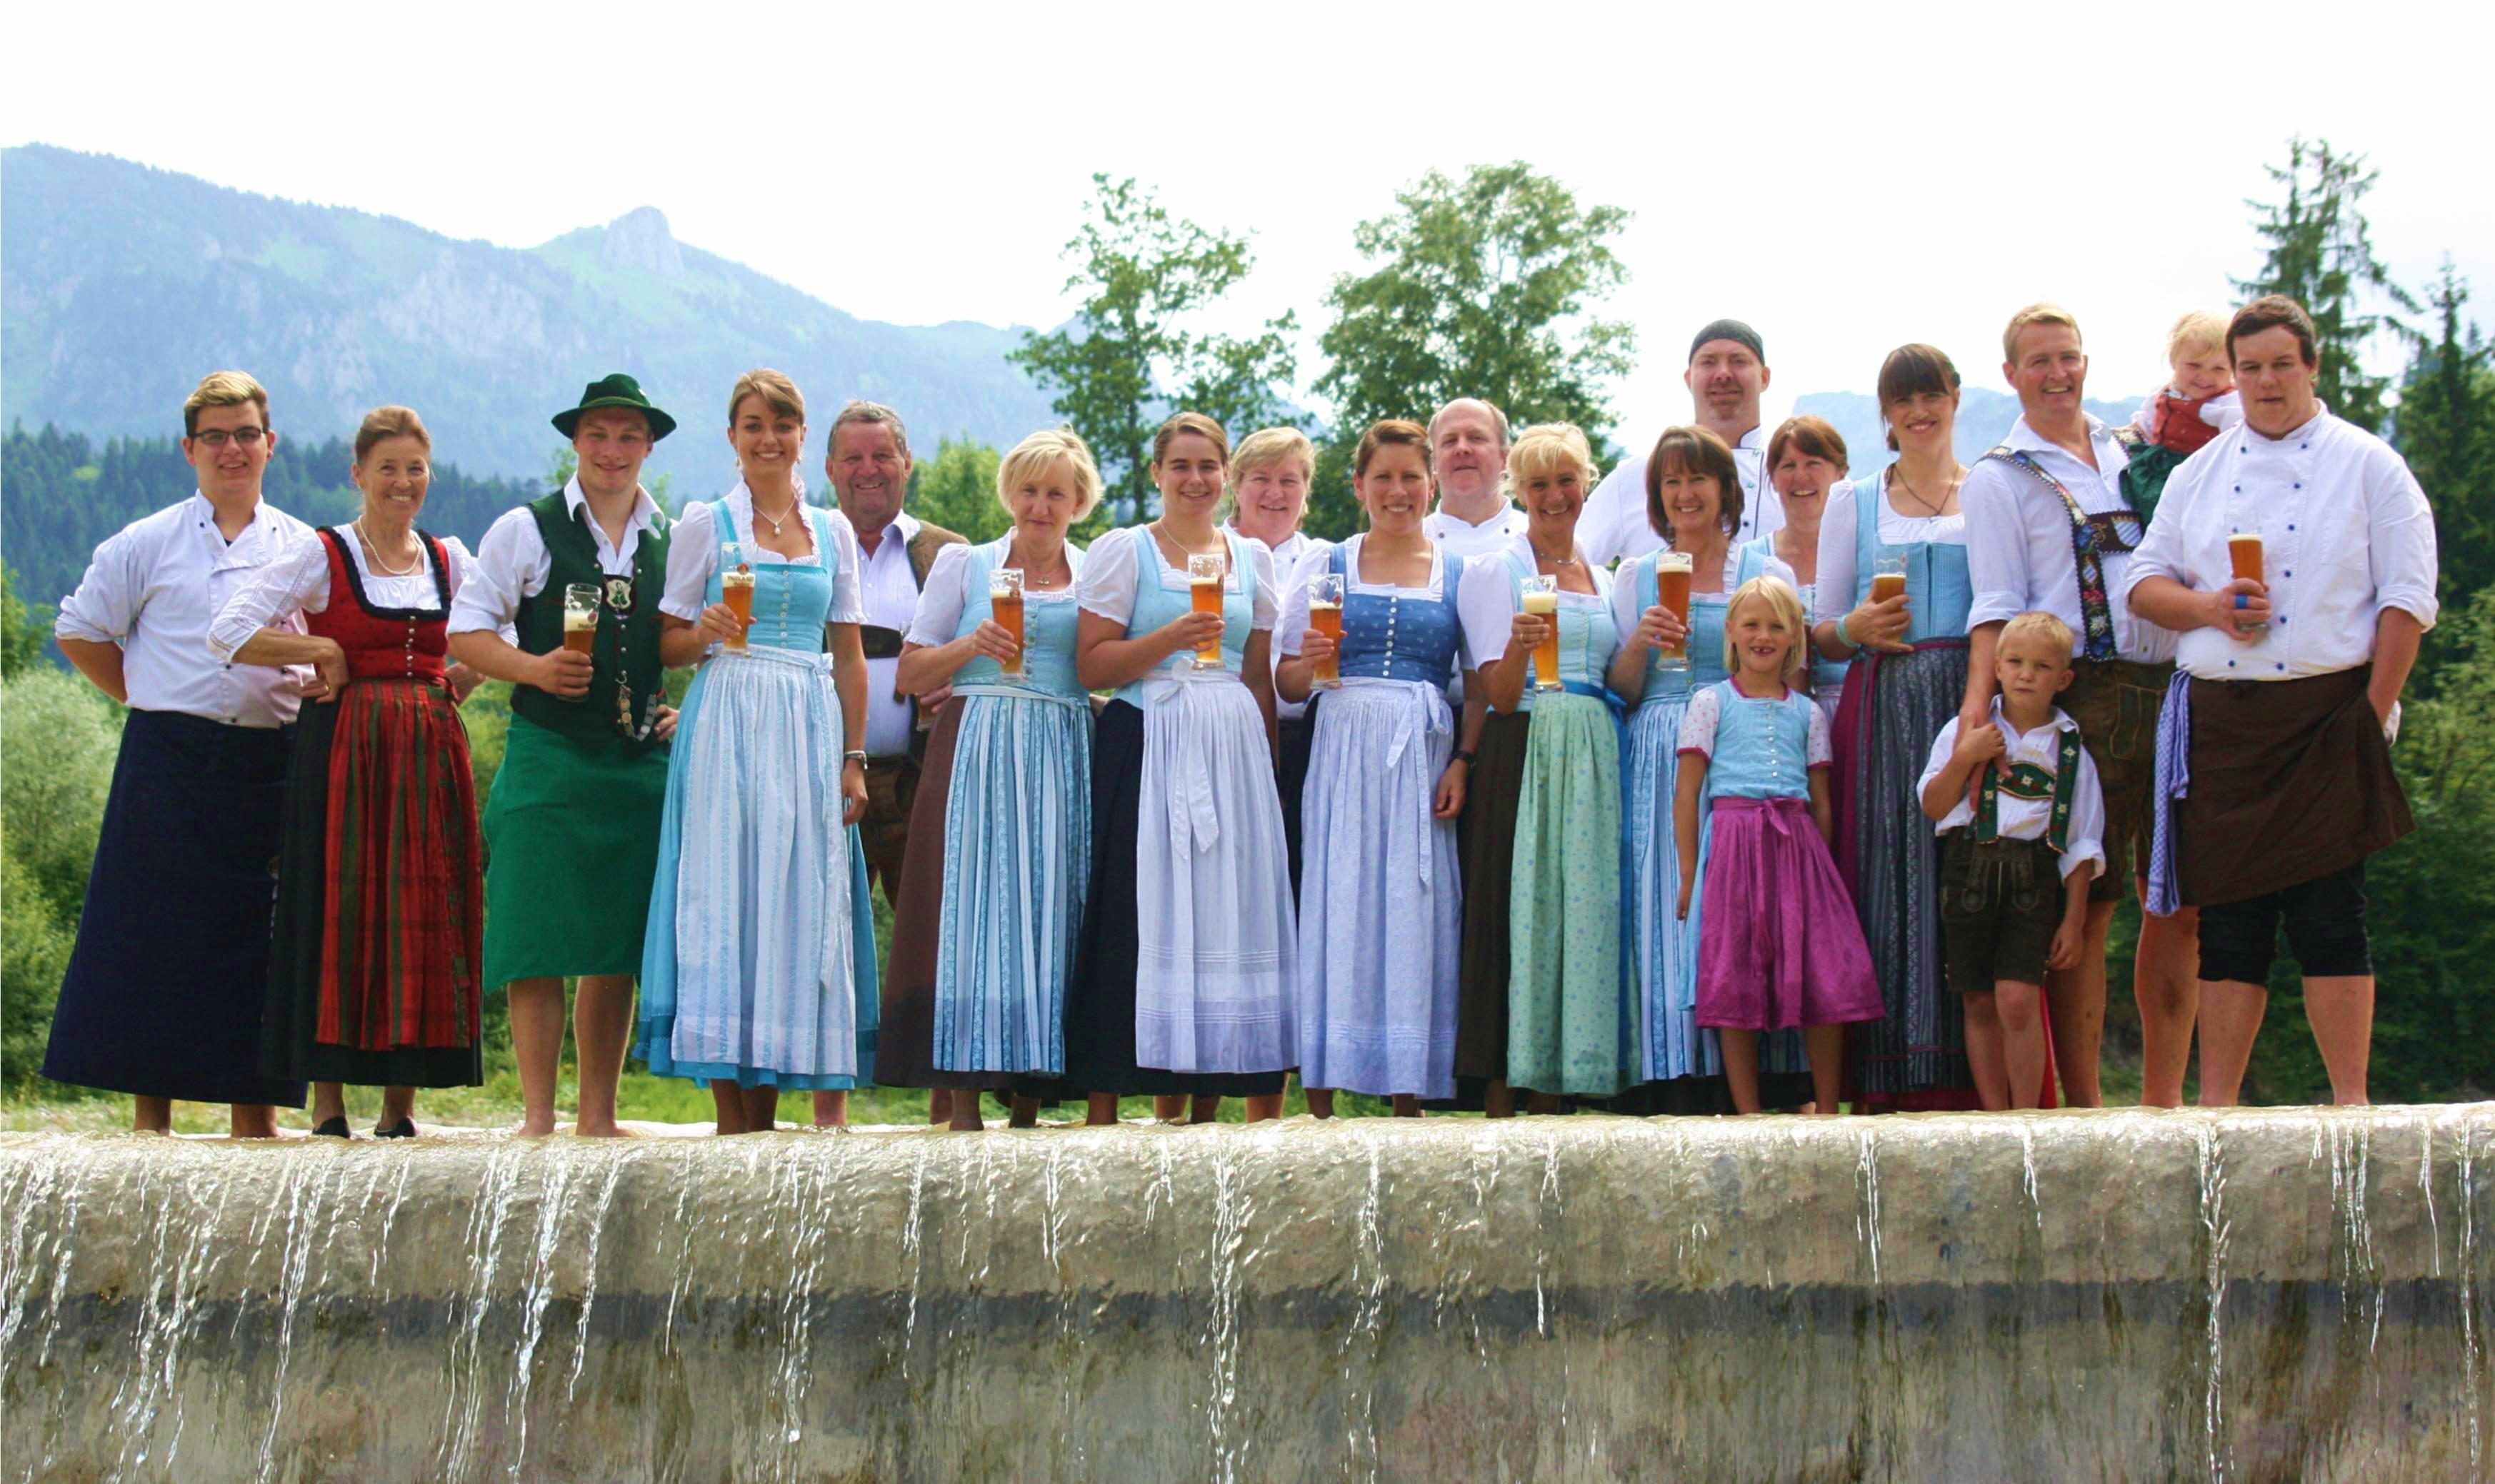 Arzbacherhof 2016 im Arzbach 051 - Kopie